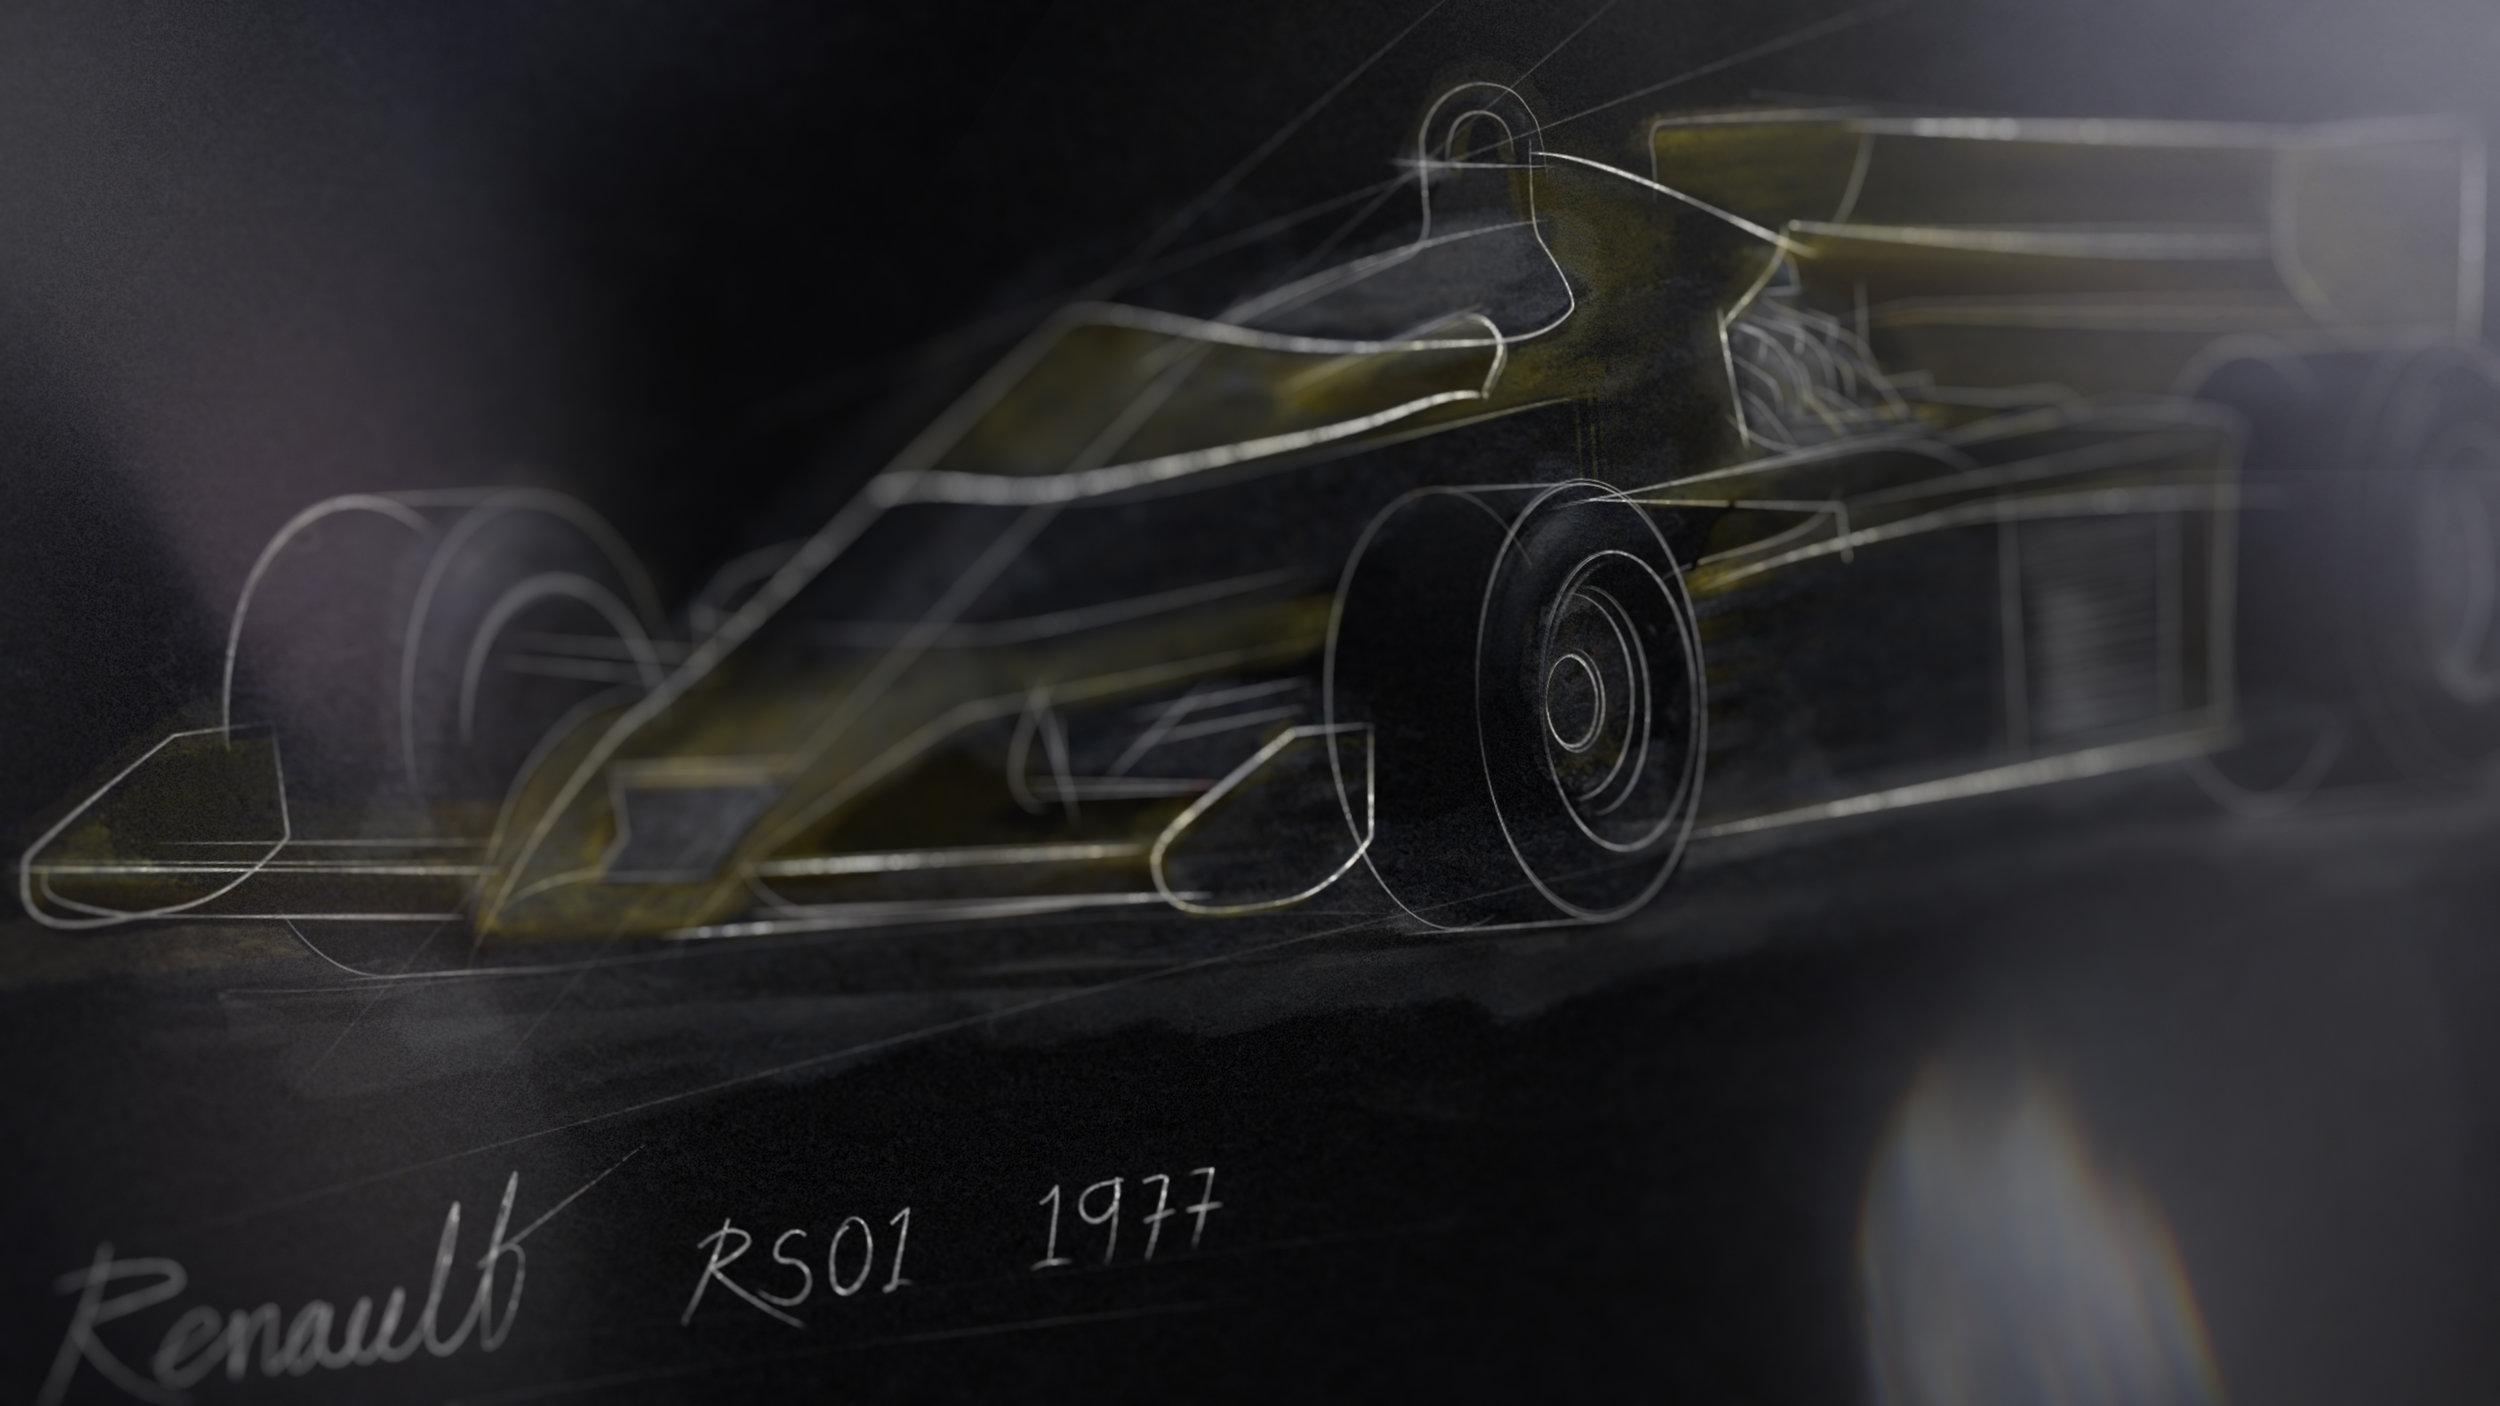 RS01 Concept Sketch_02.jpg